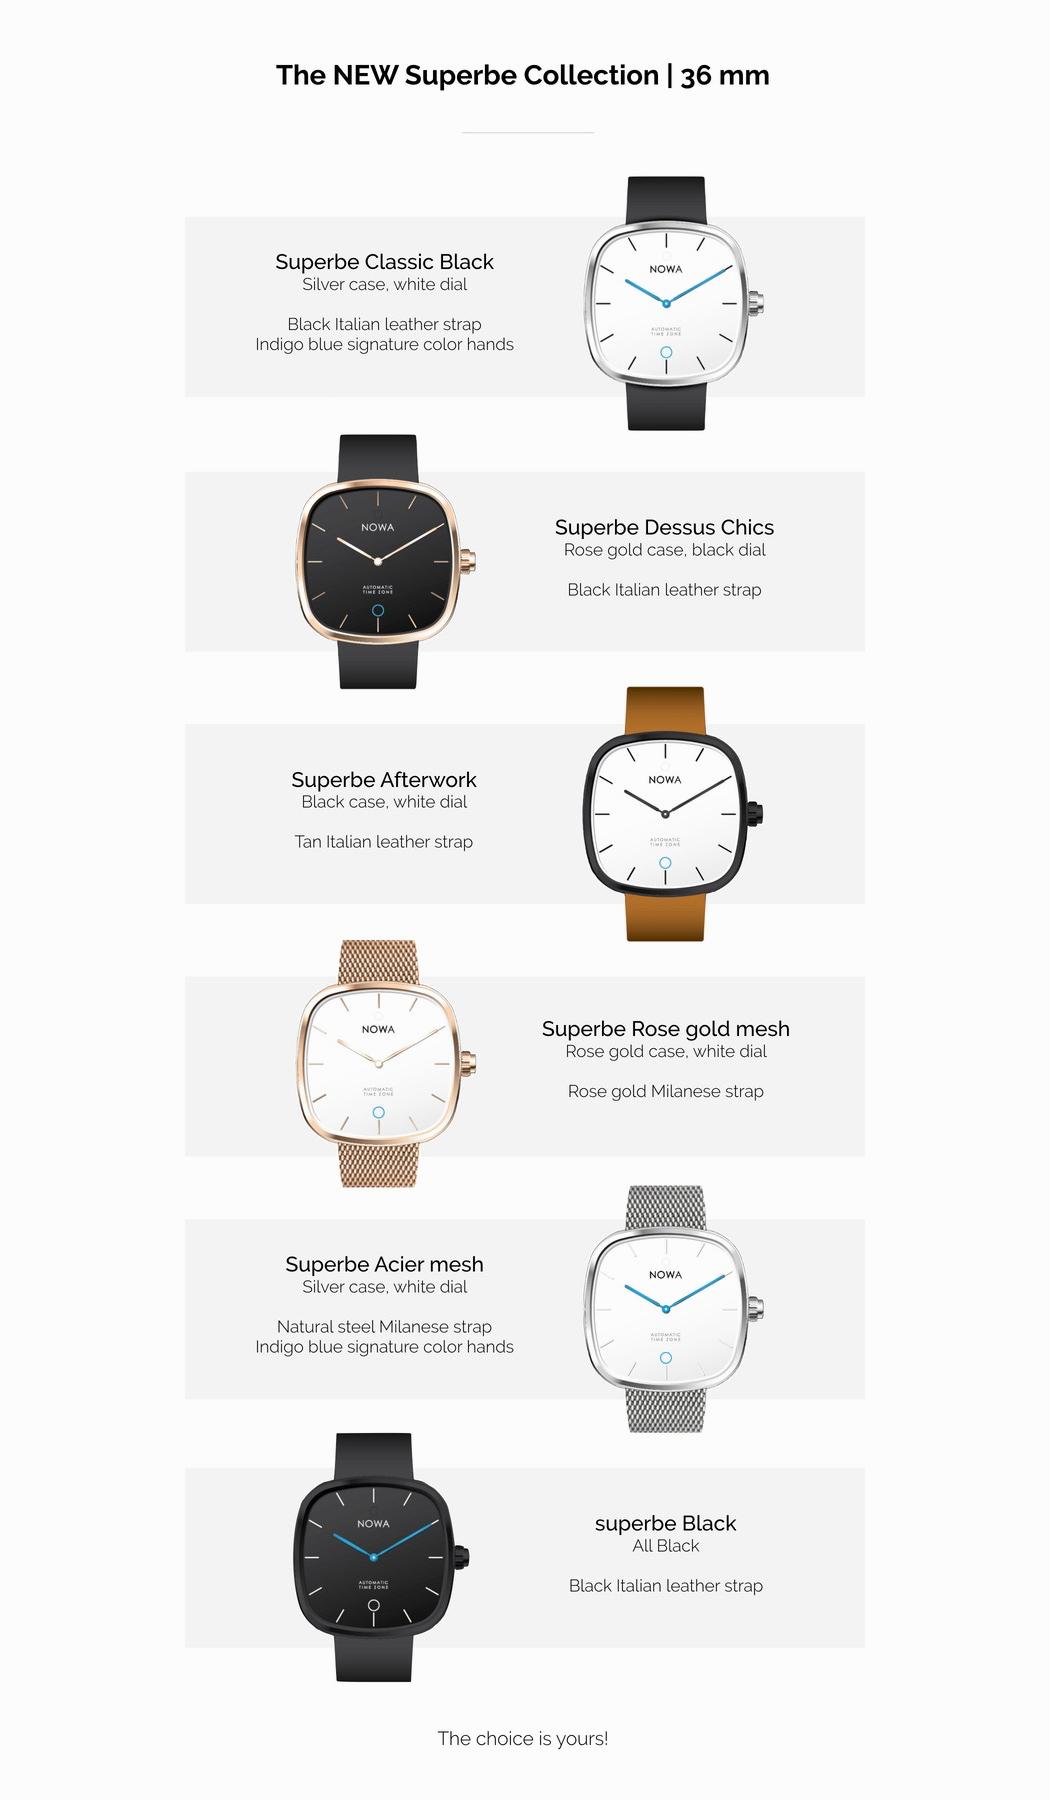 Meet the Nowa Superbe, a smartwatch that never needs